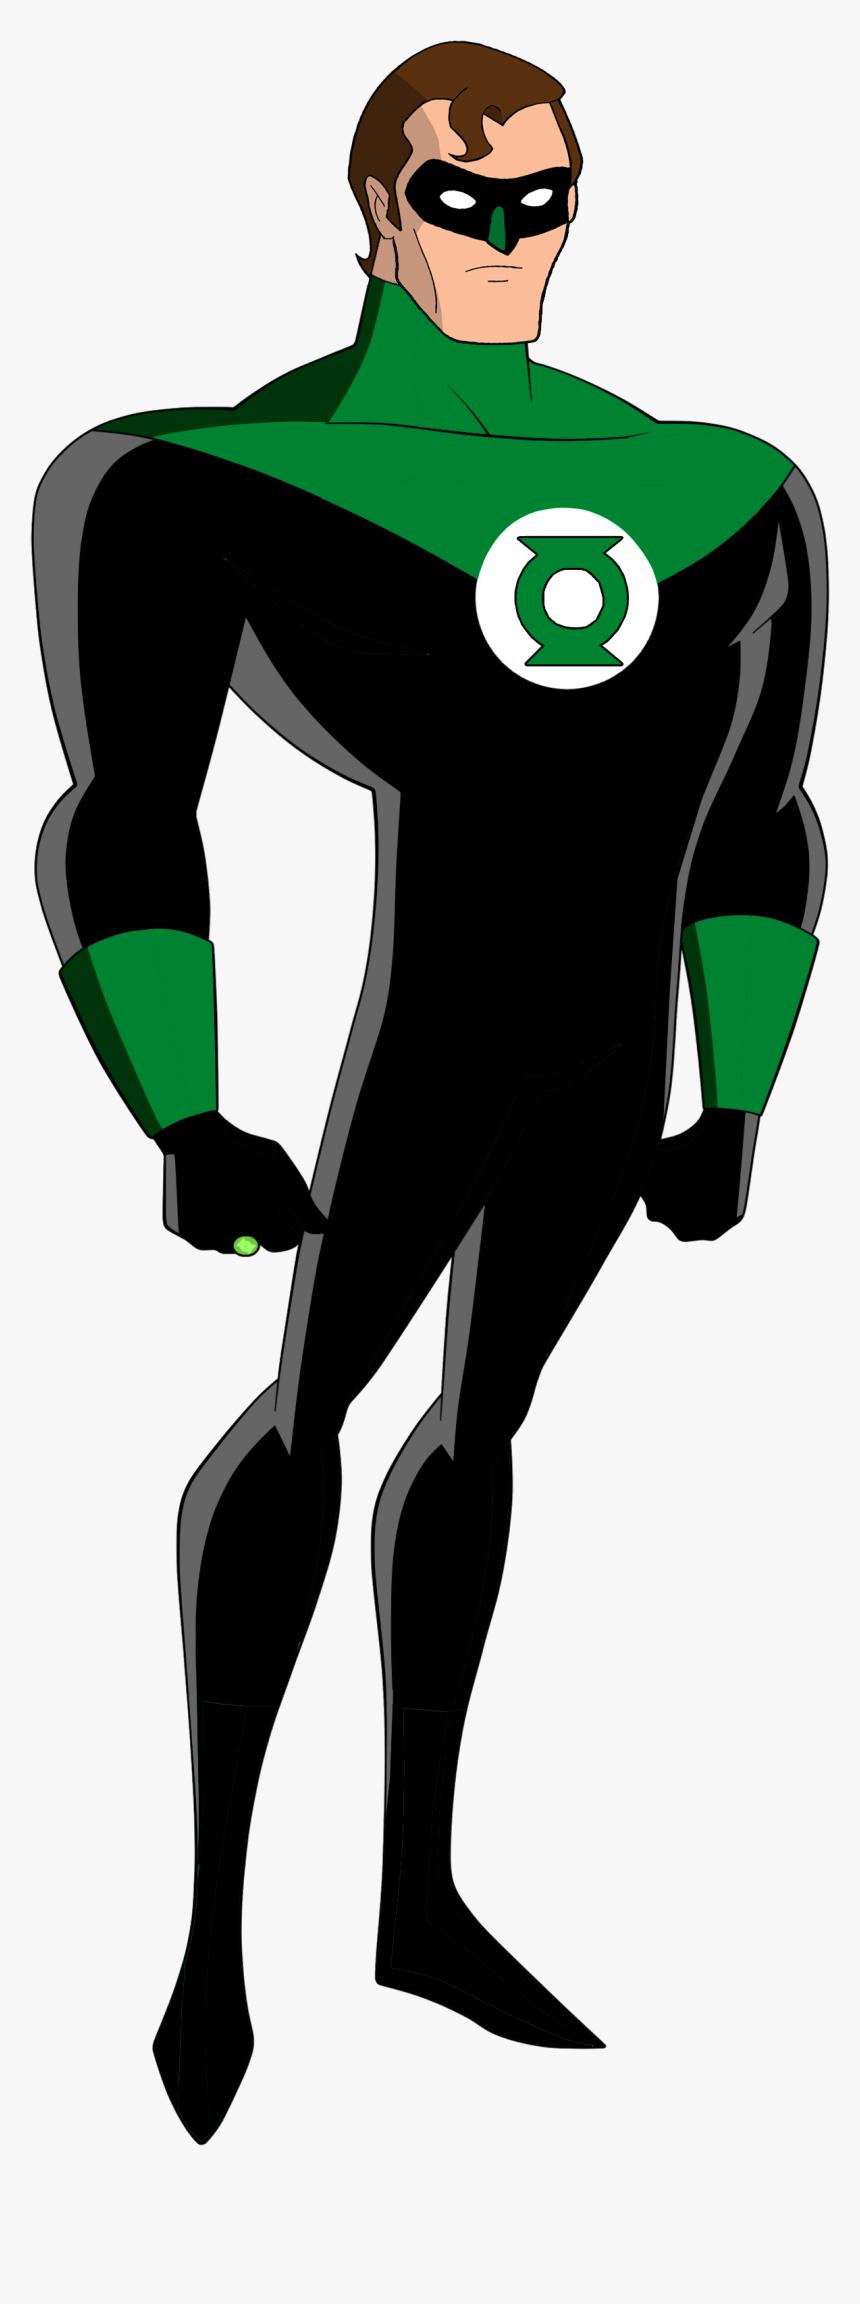 Green Lantern Clipart - Justice League Tas Green Lantern, HD Png Download, Free Download